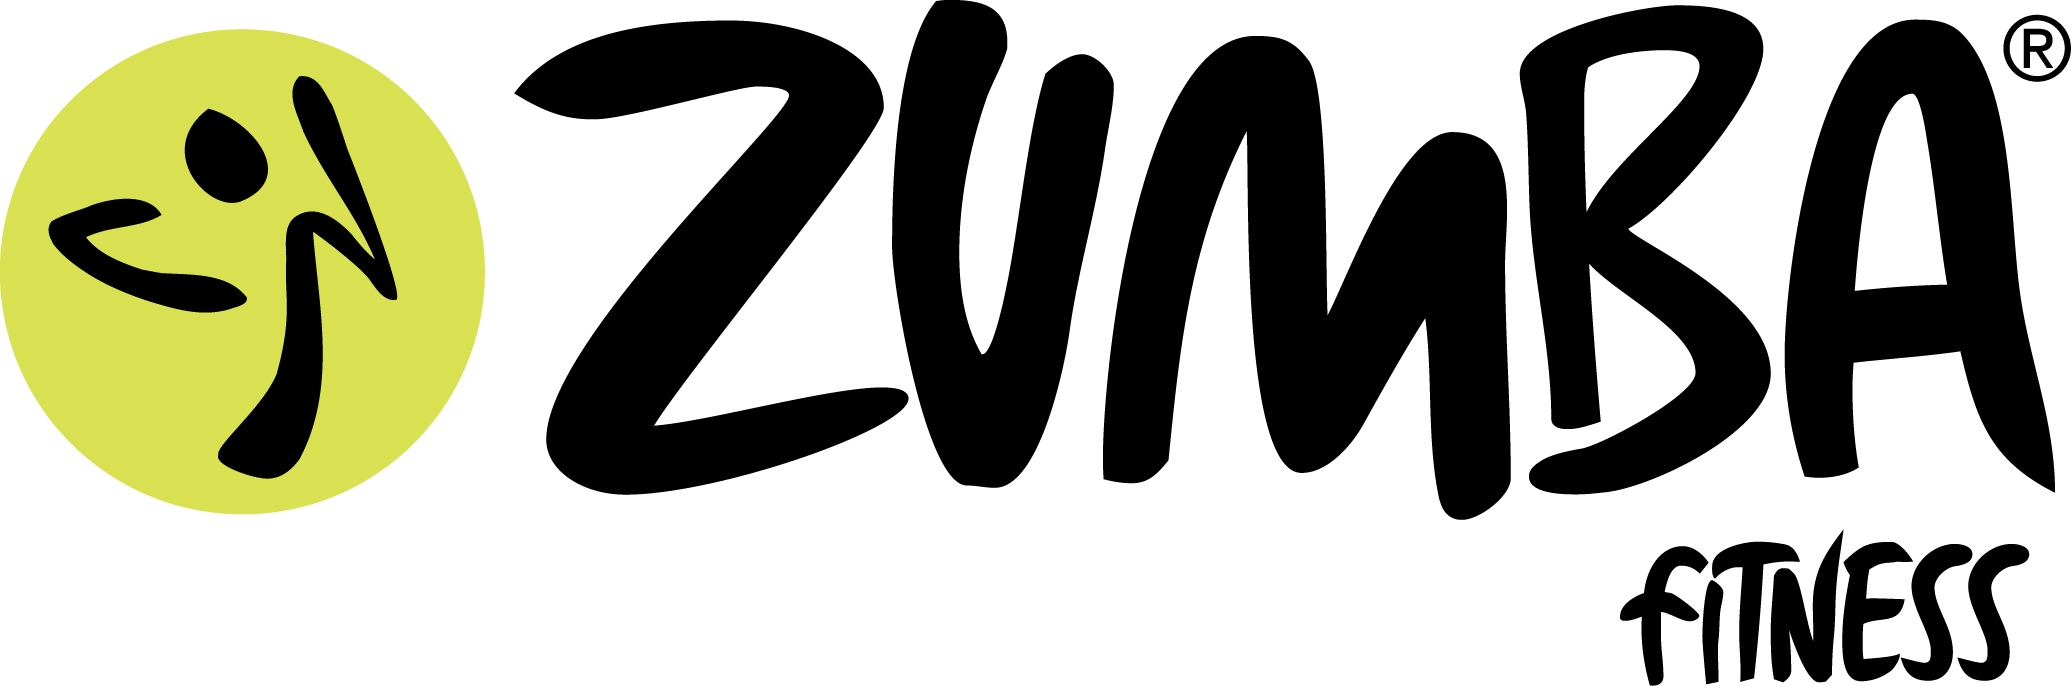 Gimnasio Shotokan - Zumba - Tu gimnasio en Gijón